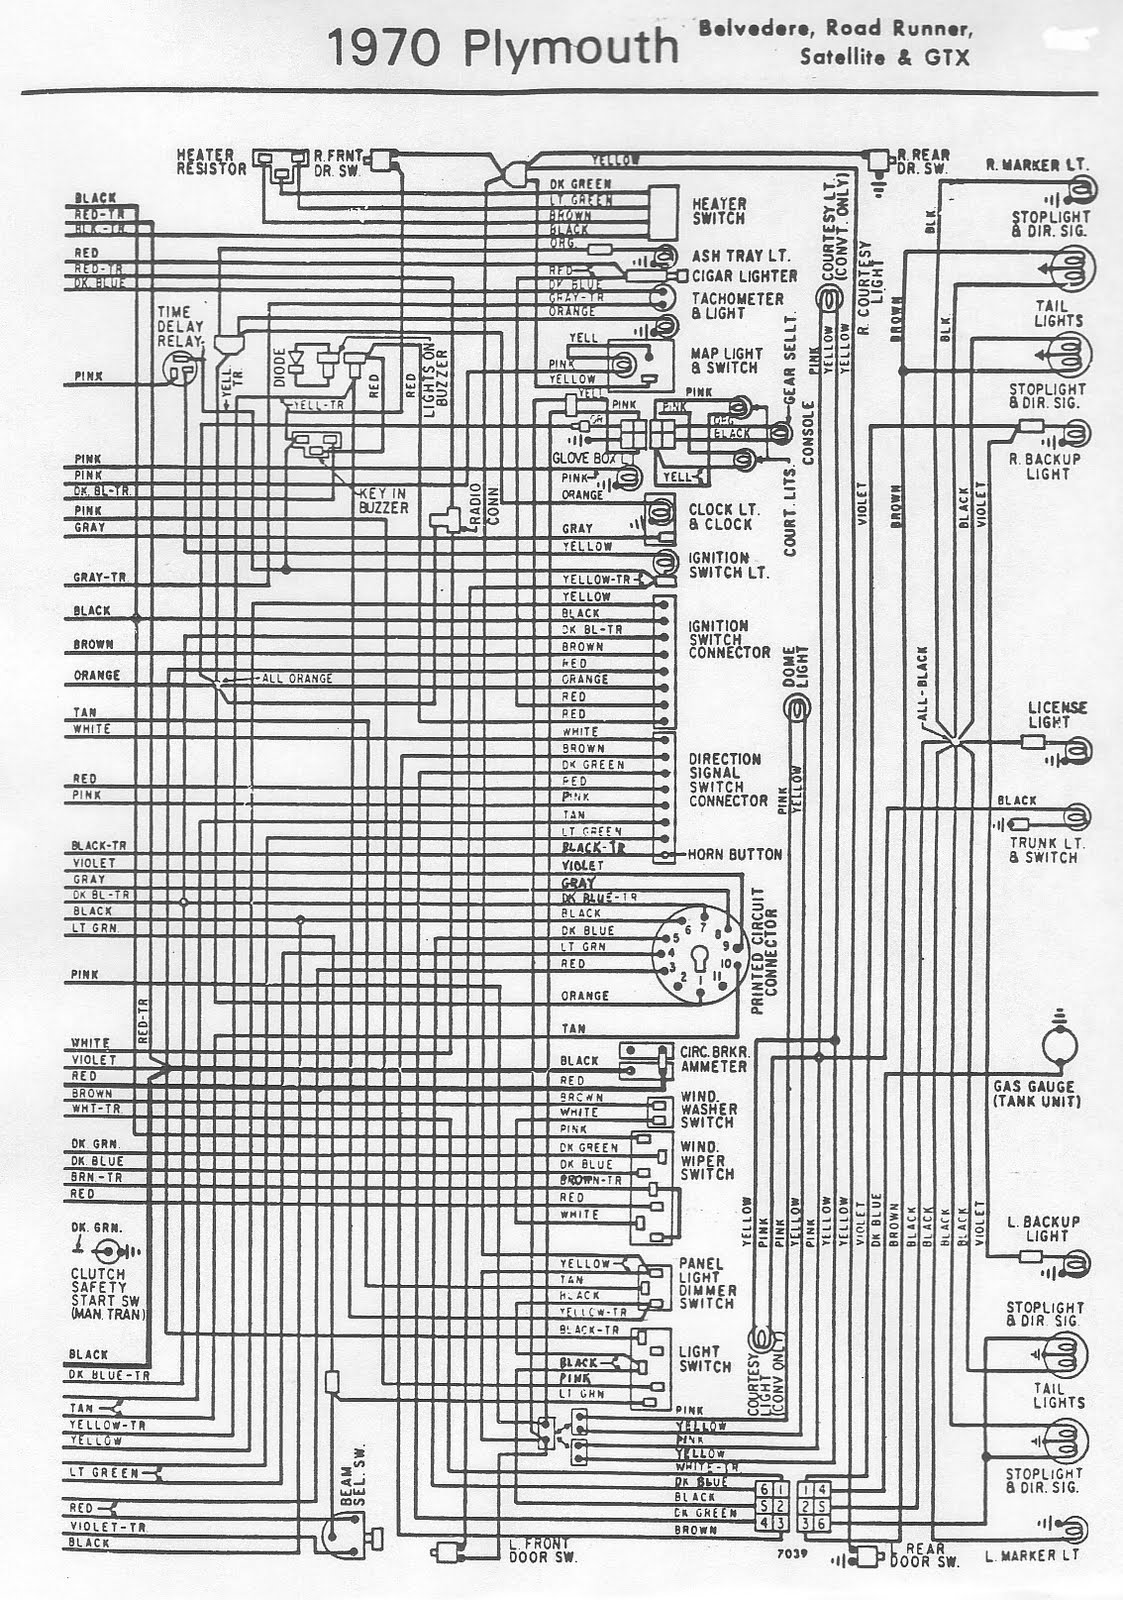 Magnificent Mopar Ecu Wiring Diagram Composition - Wiring Diagram ...